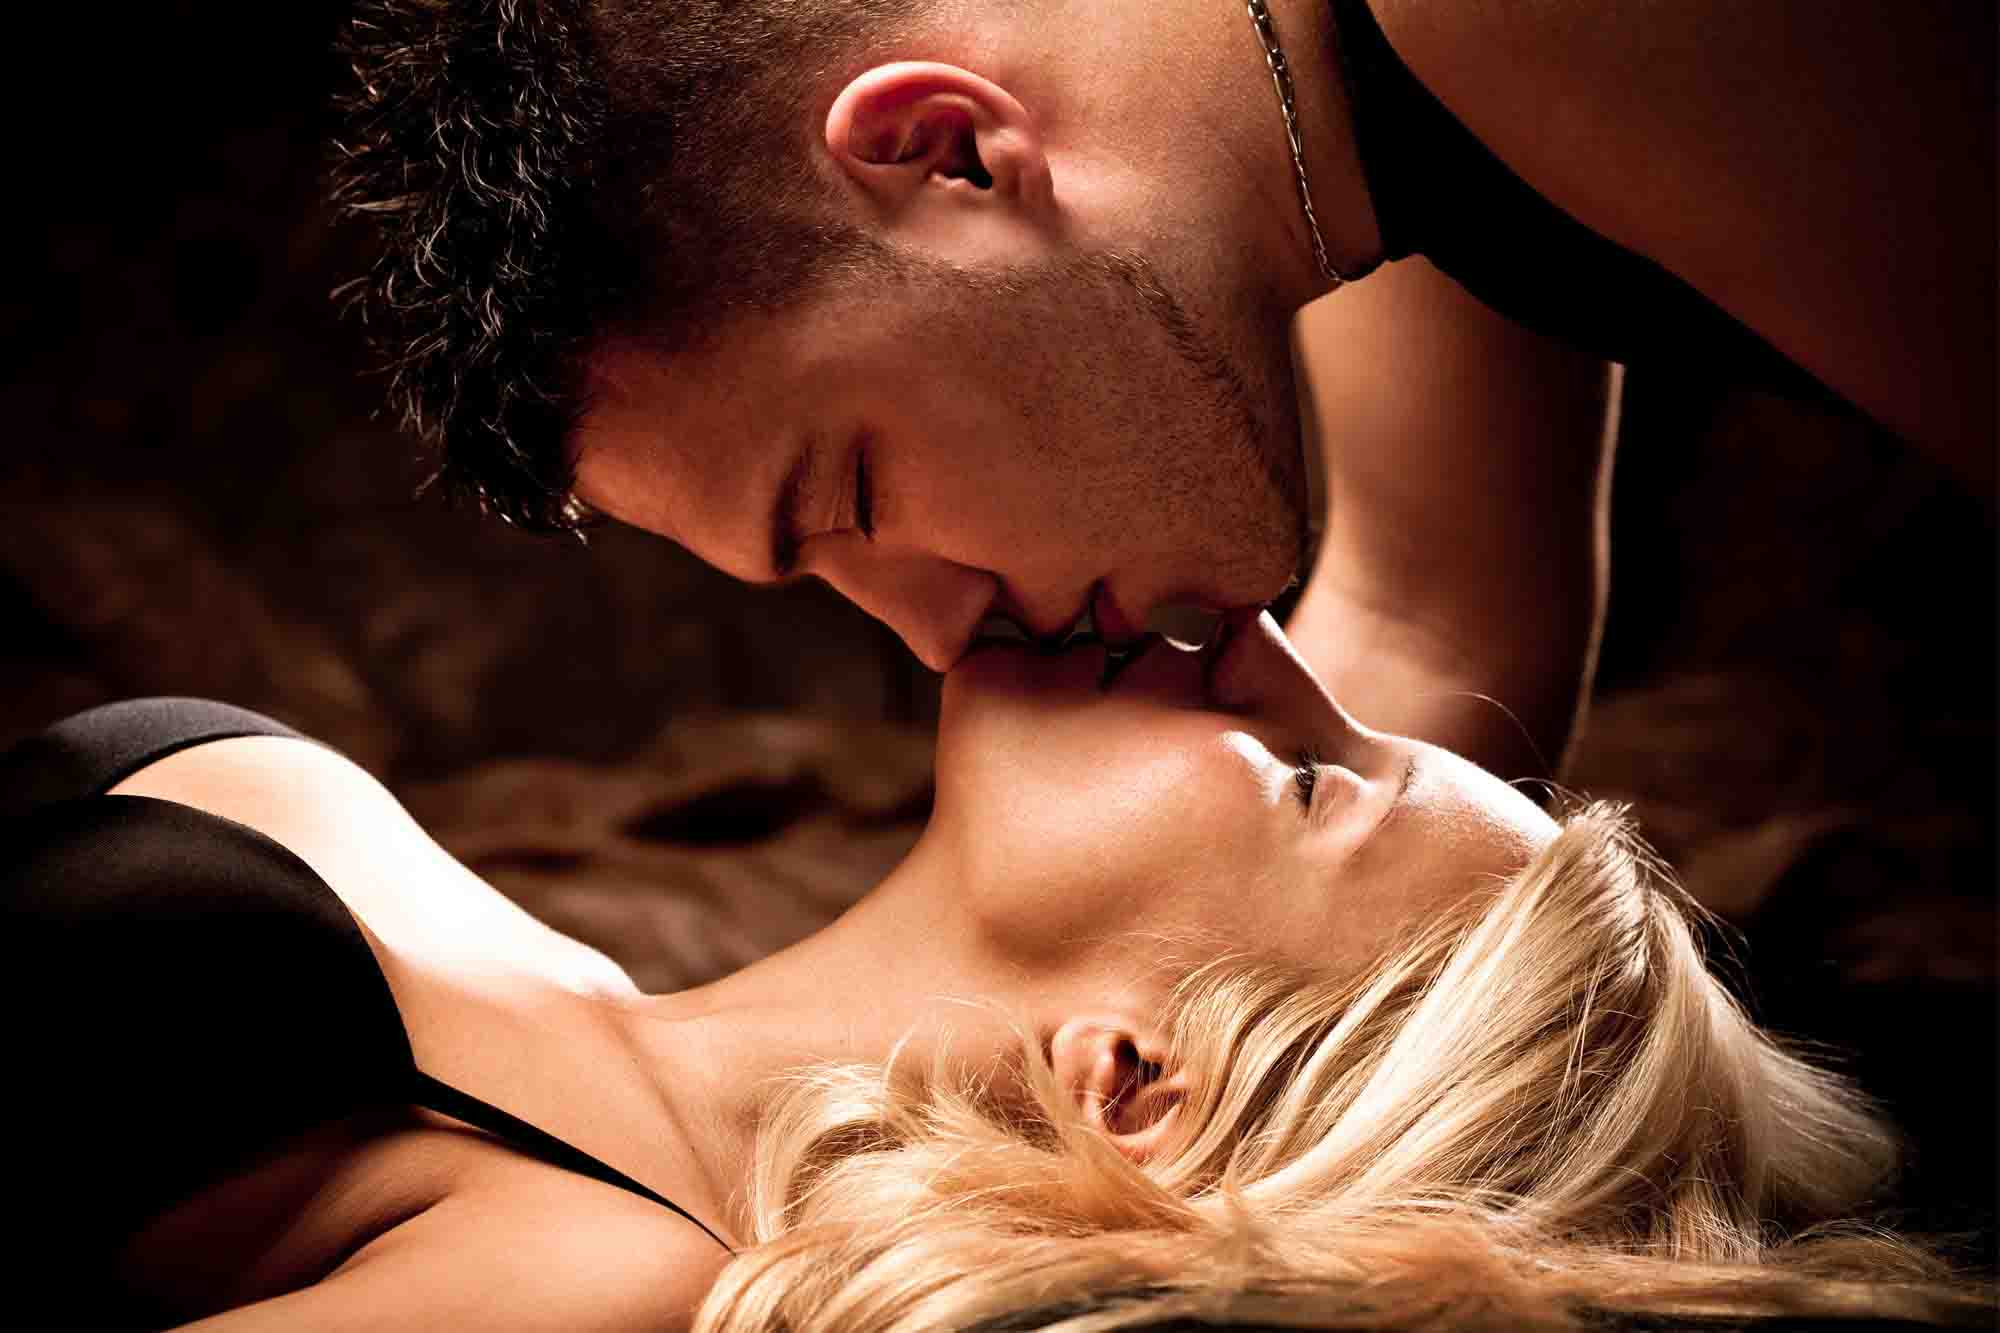 Фото красивого поцелуя девушек 24 фотография